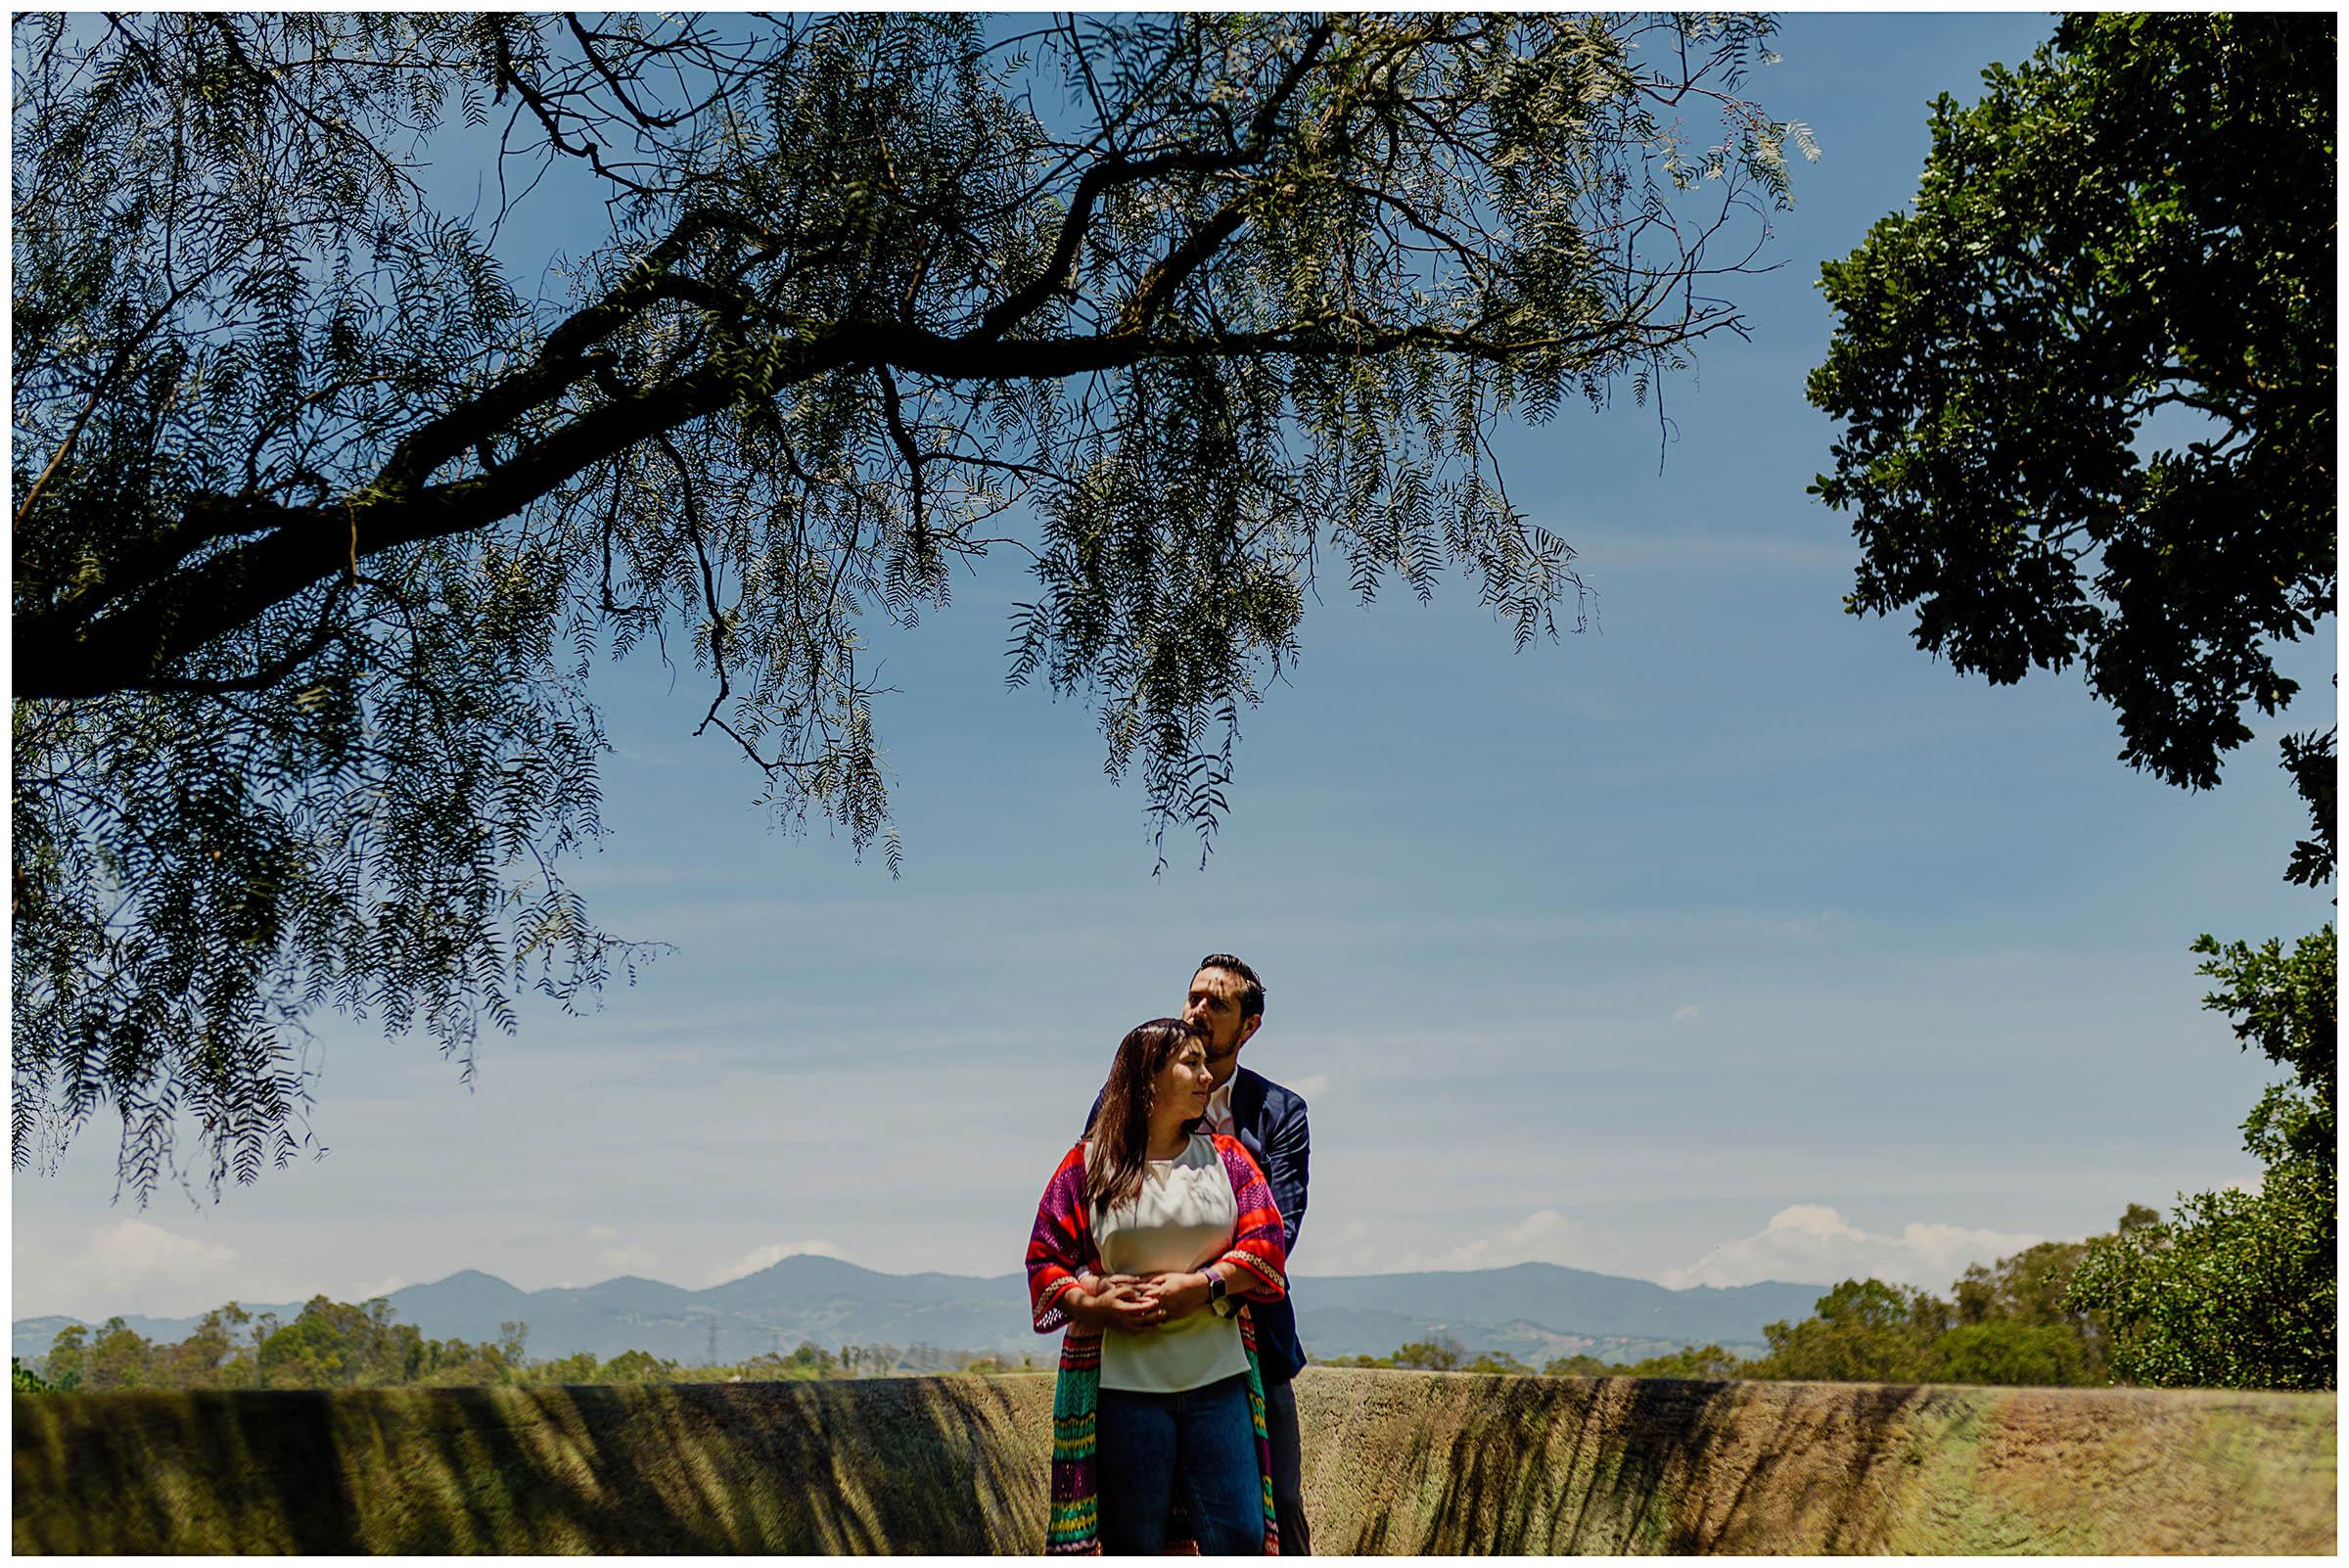 nido quetzalcoatl juan luis jimenez fotografo bodas cdmx destino vitrales abstracto 39.JPG